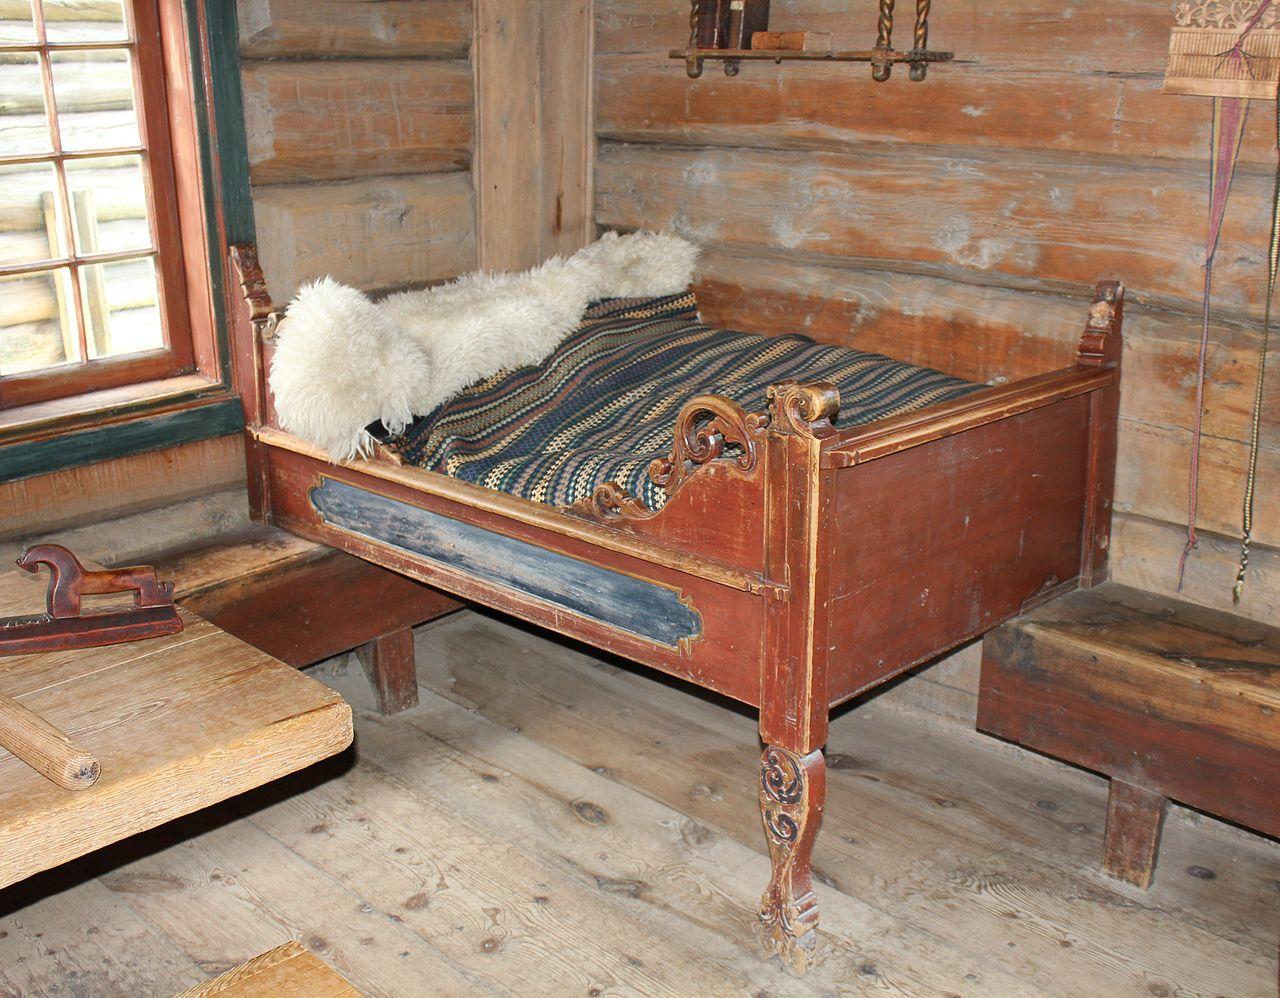 gammel seng File:Gammel seng på Maihaugen.   Wikimedia Commons gammel seng